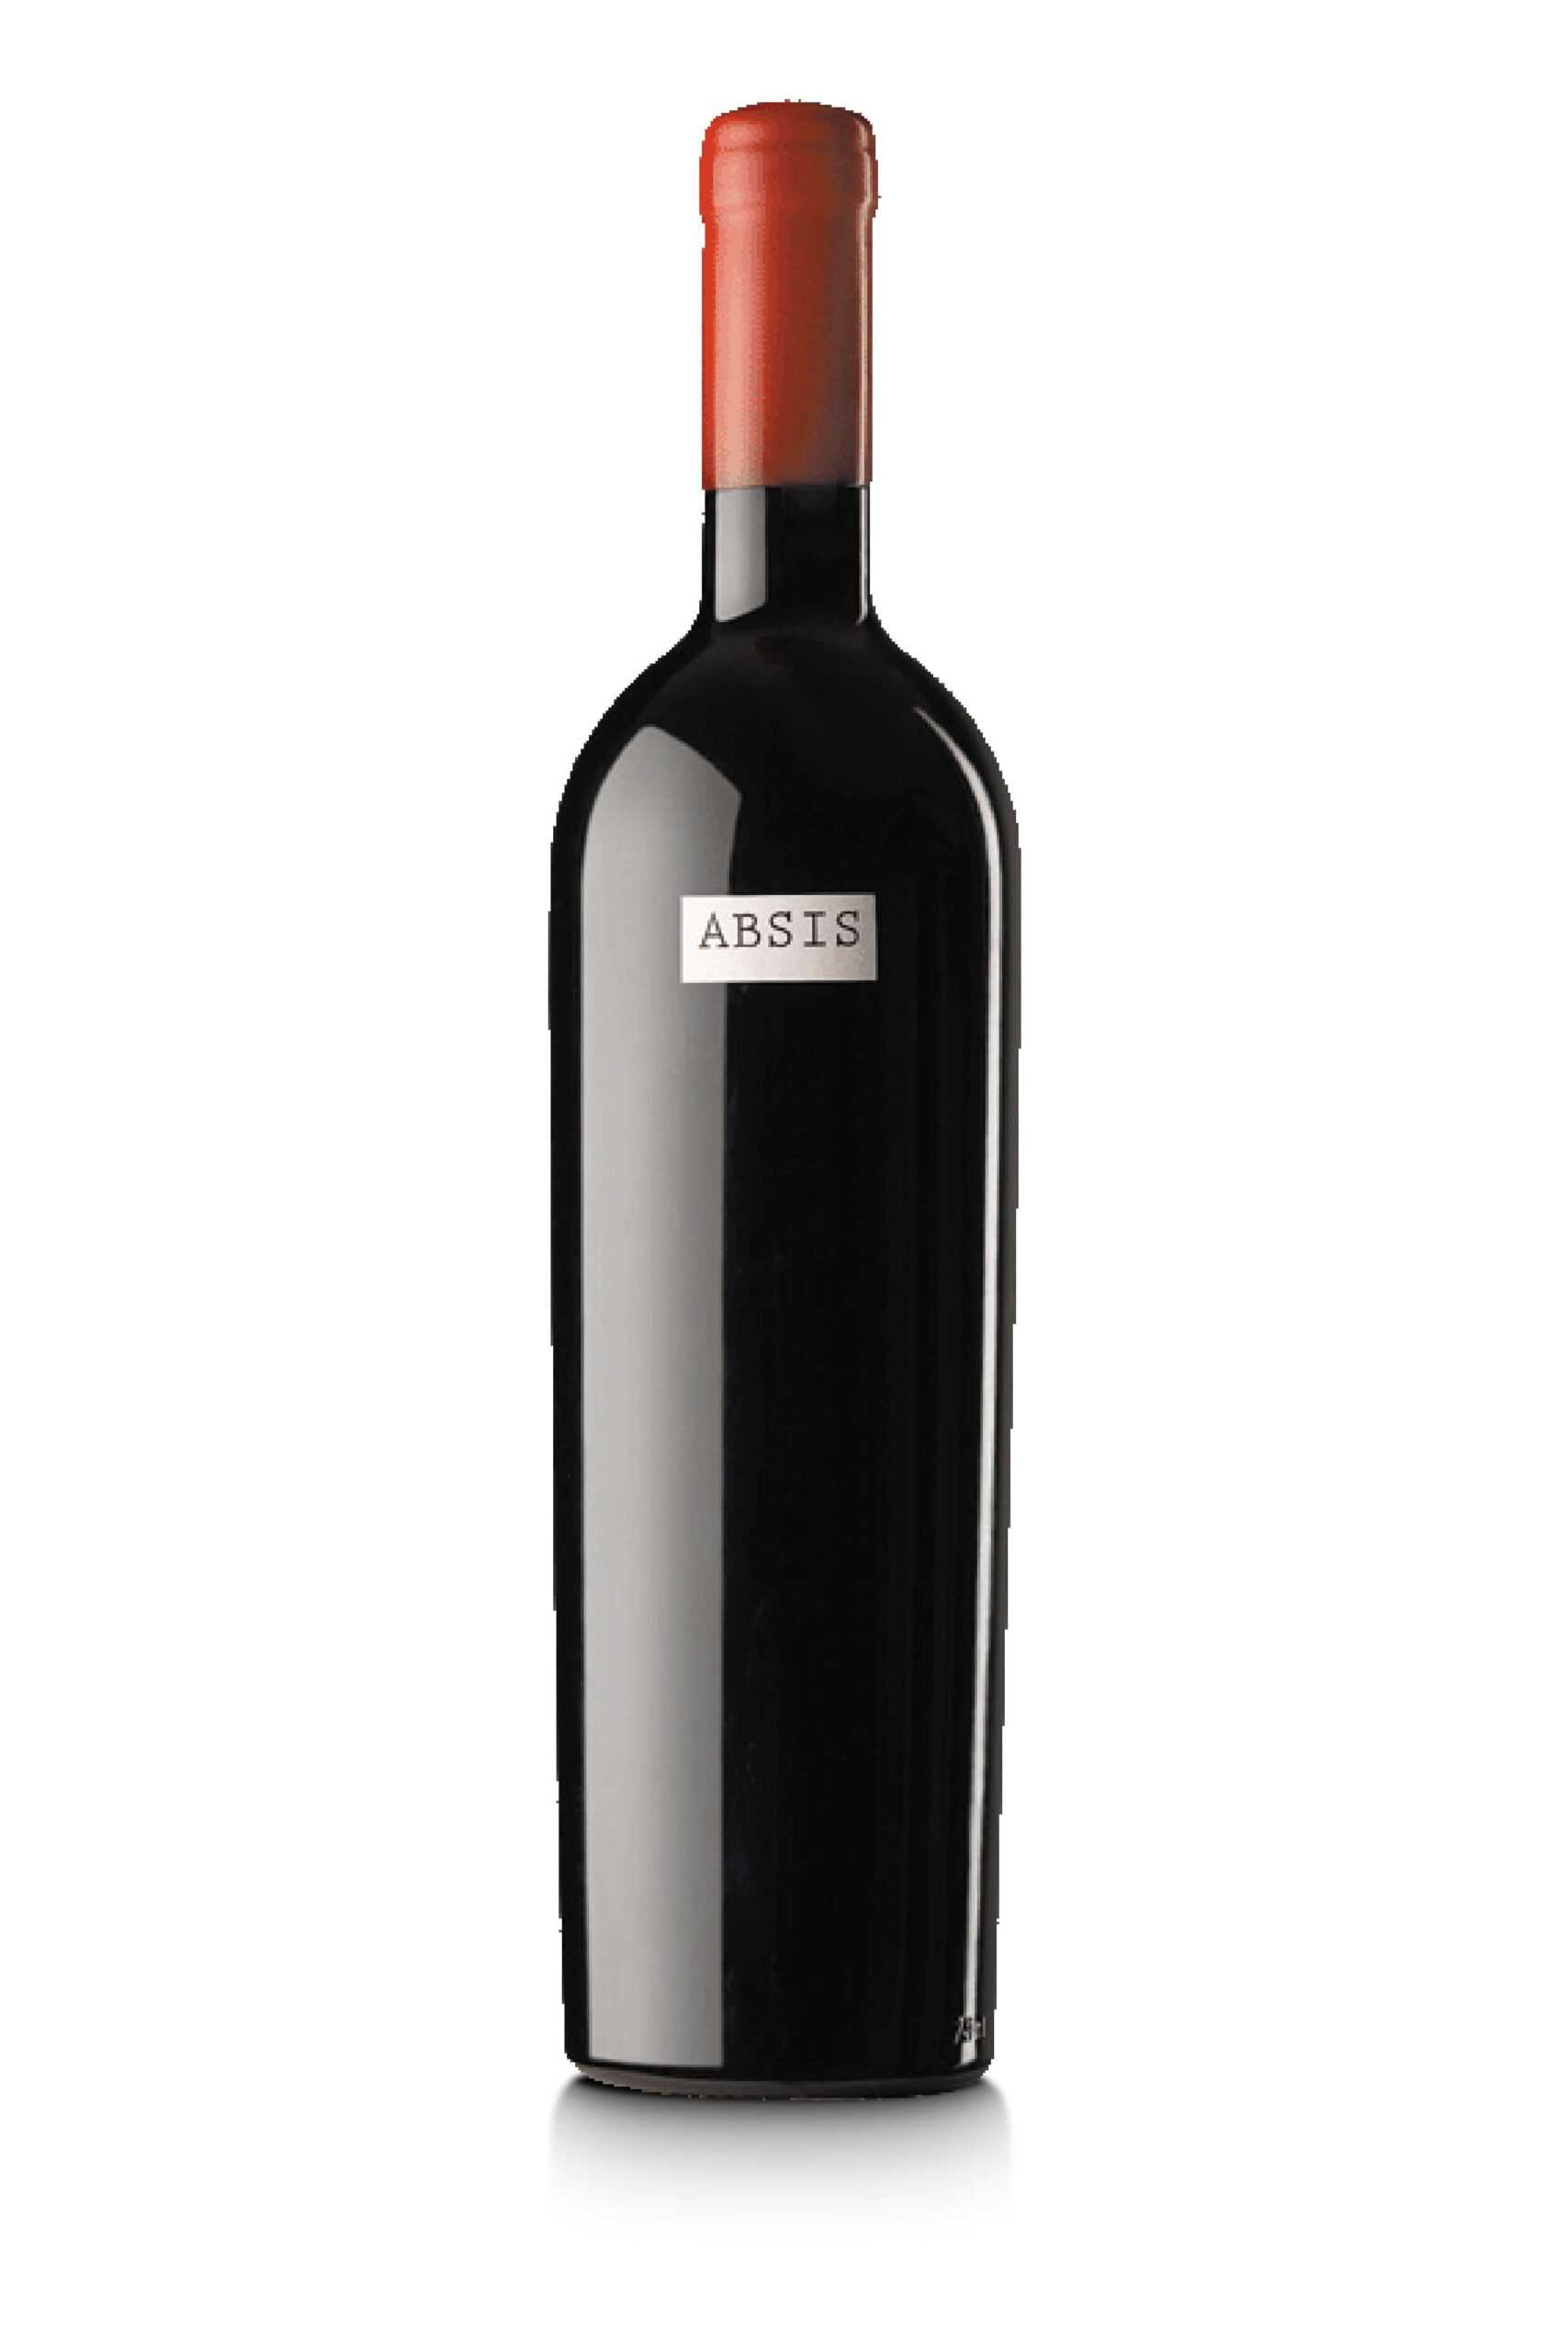 Absis 2017 vino absis pares balta 01 scaled